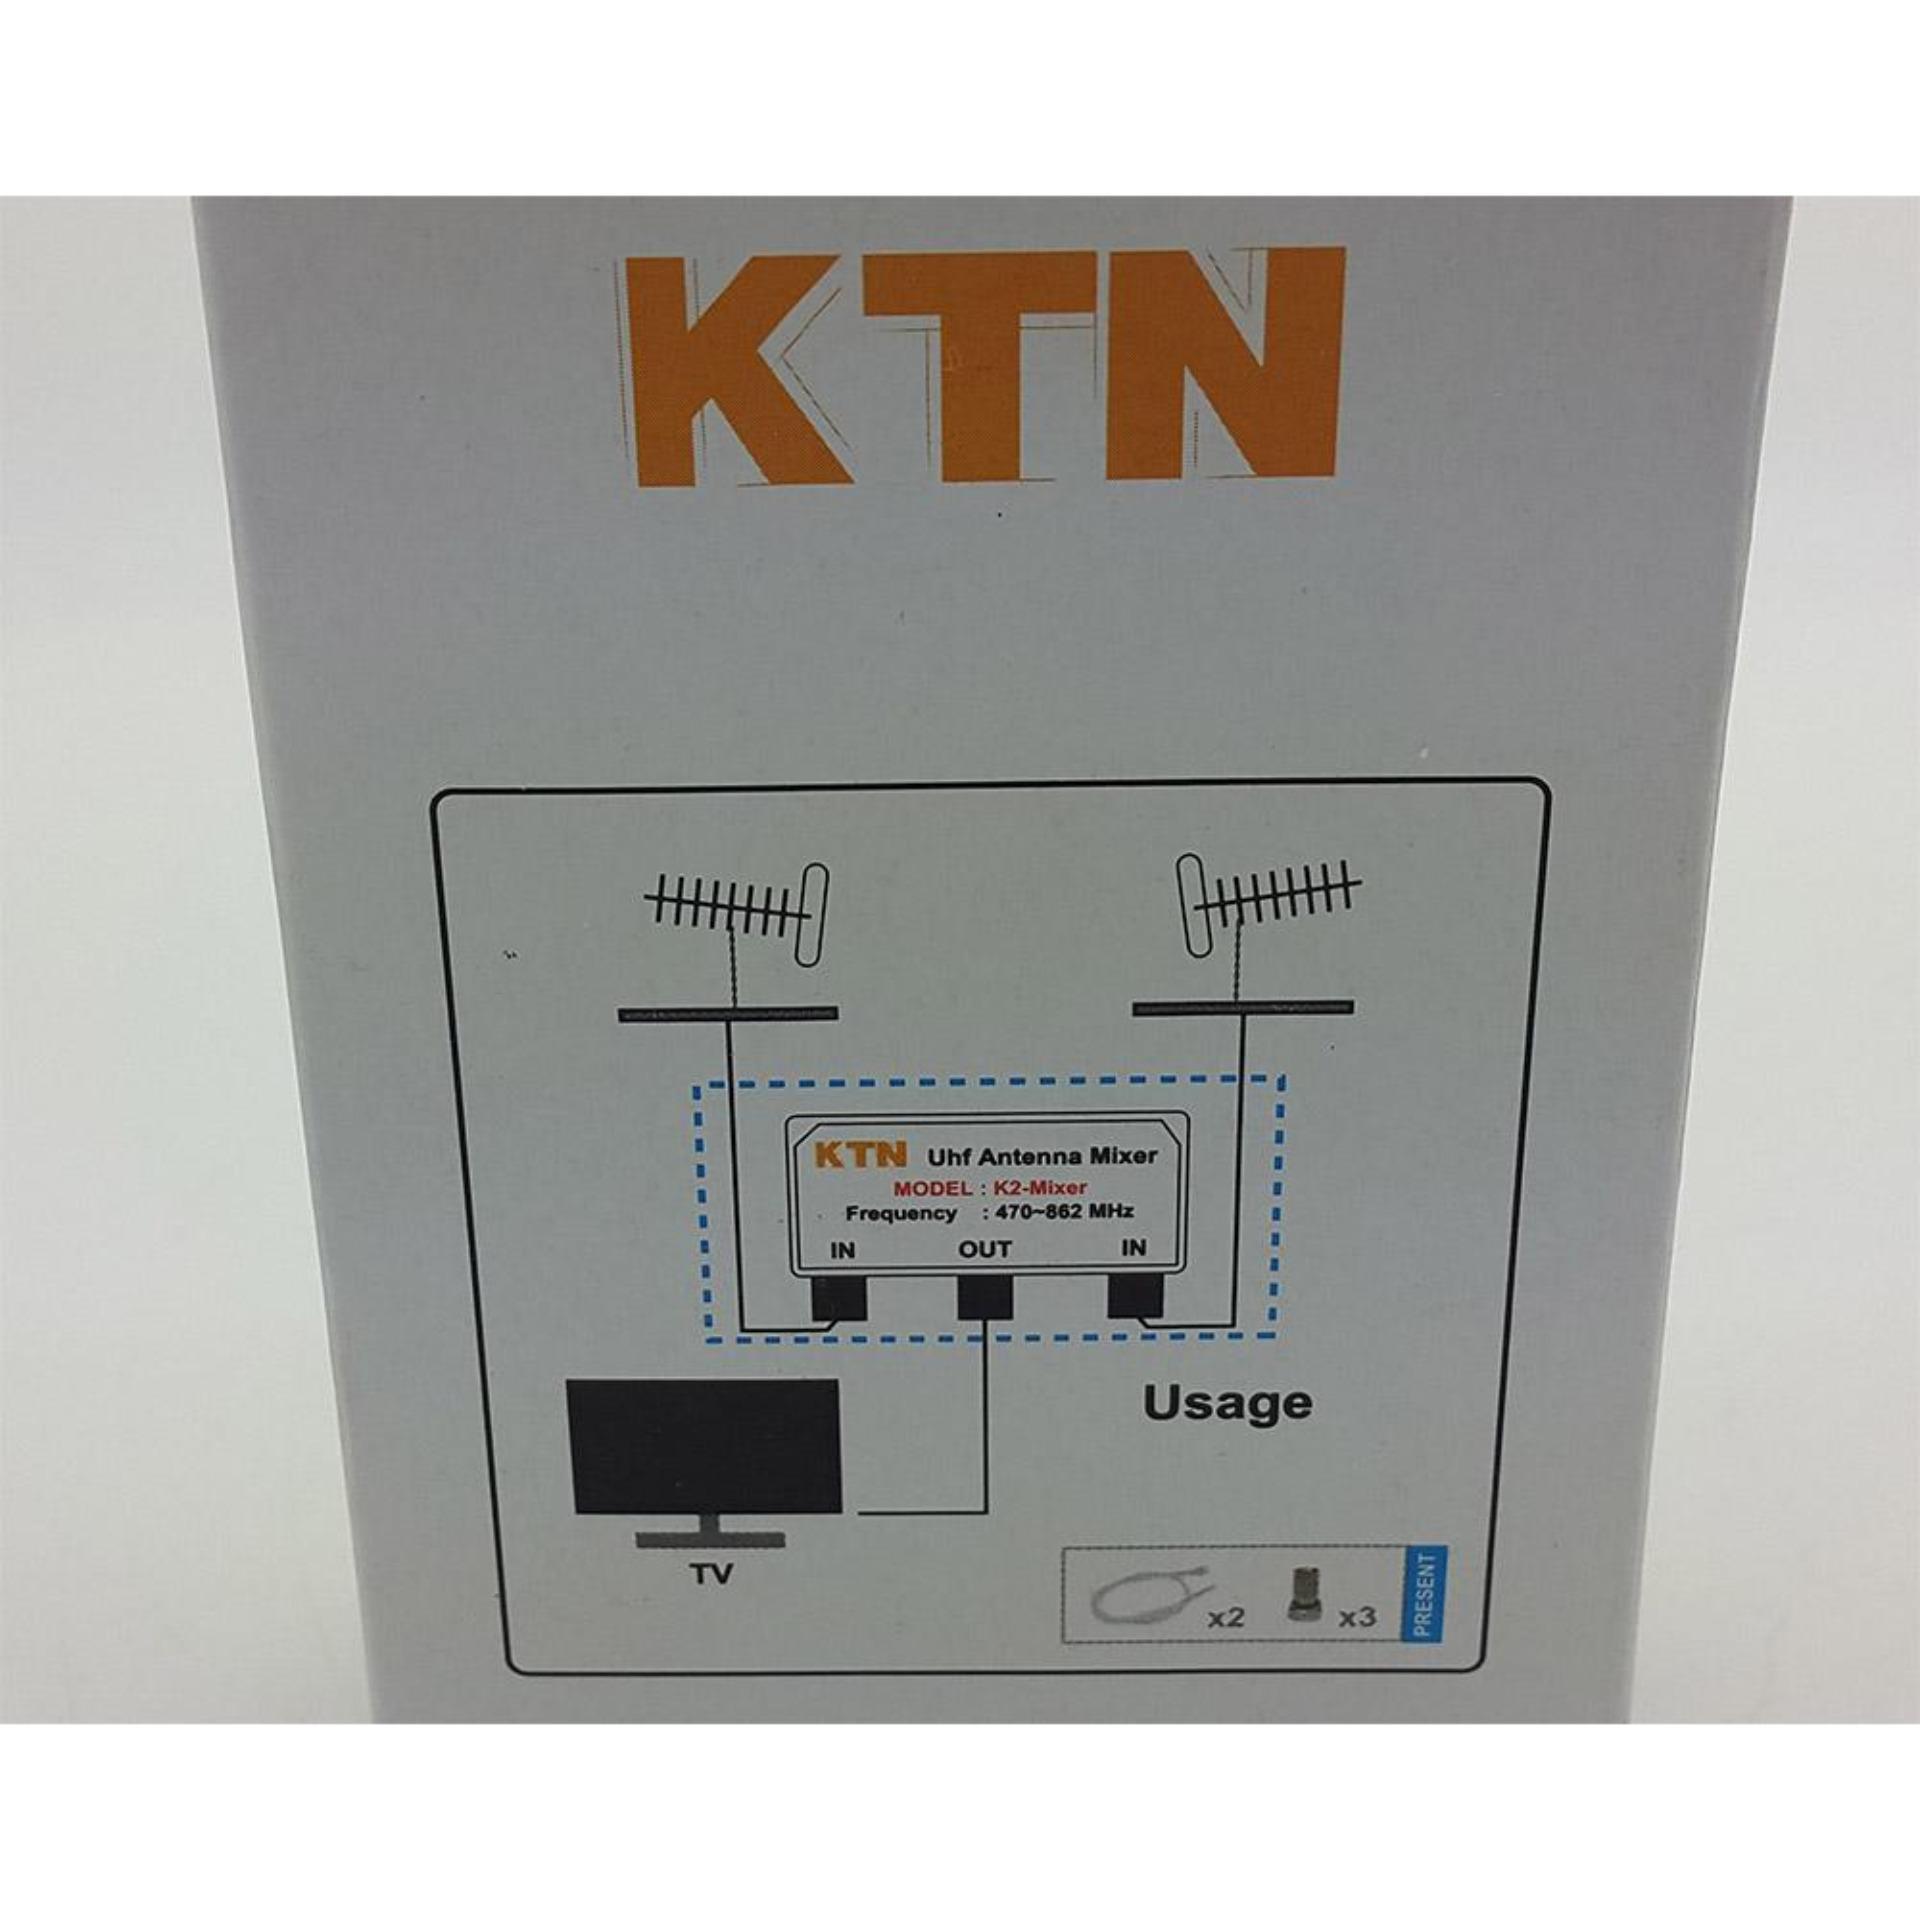 DISKON ANTENA TOYOSAKI INDOOR TYS 468AW Shopee Indonesia Source · KITANI 2 antena UHF jadi 1 UHF Digital Antenna Mixer